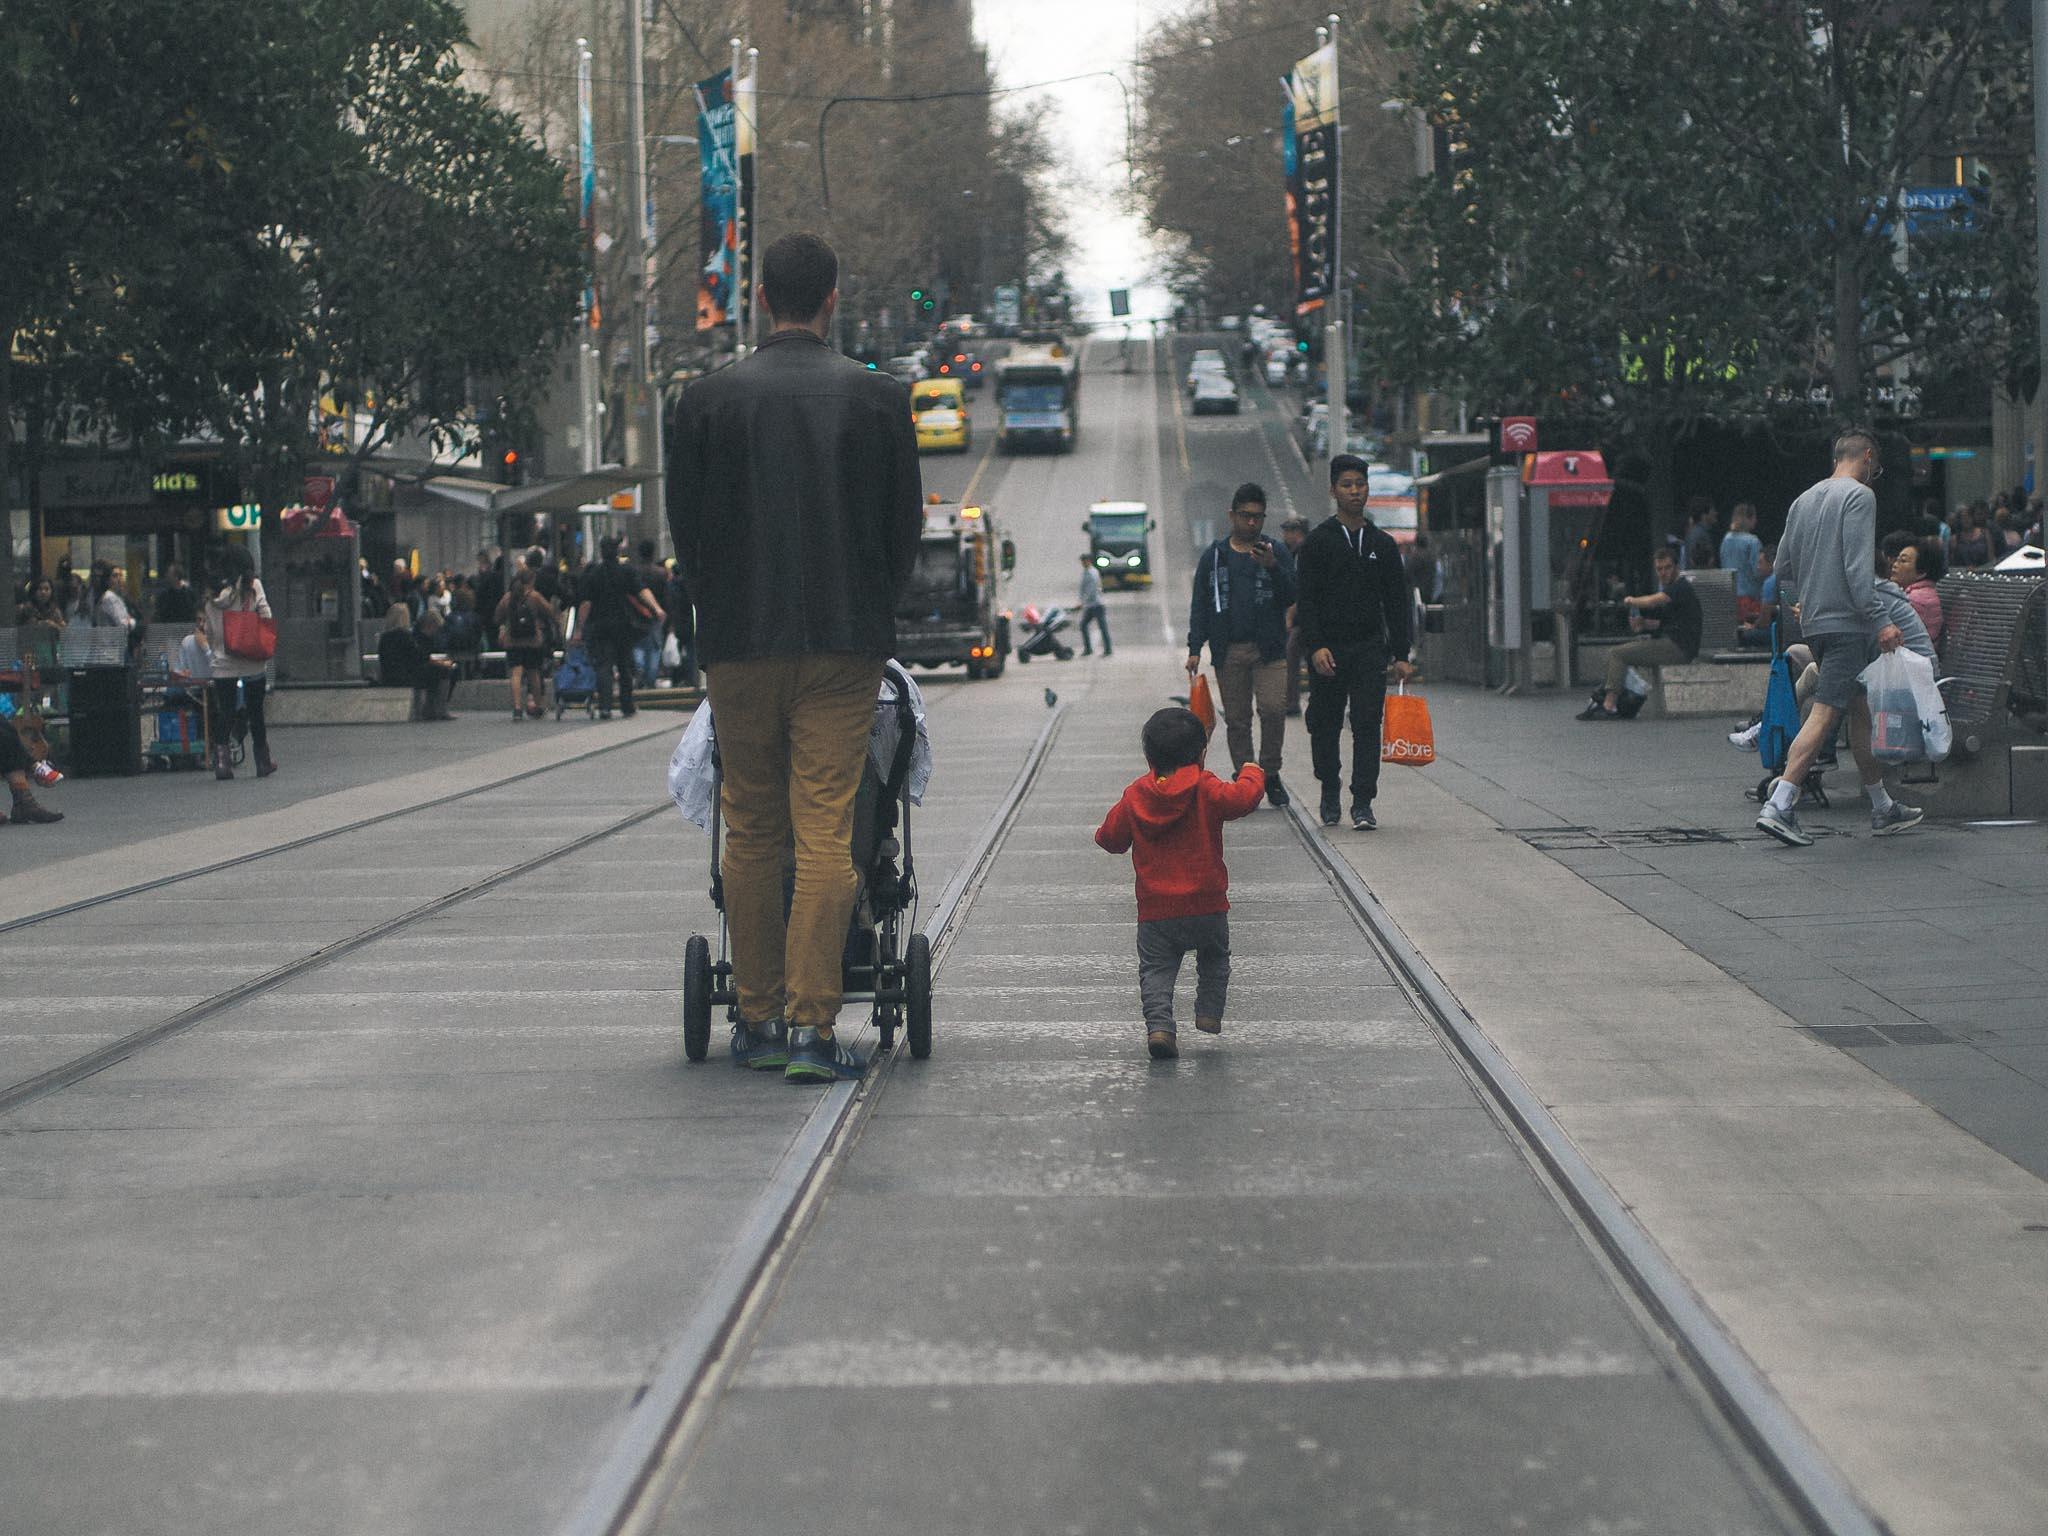 201508_Melbourne-148.jpg